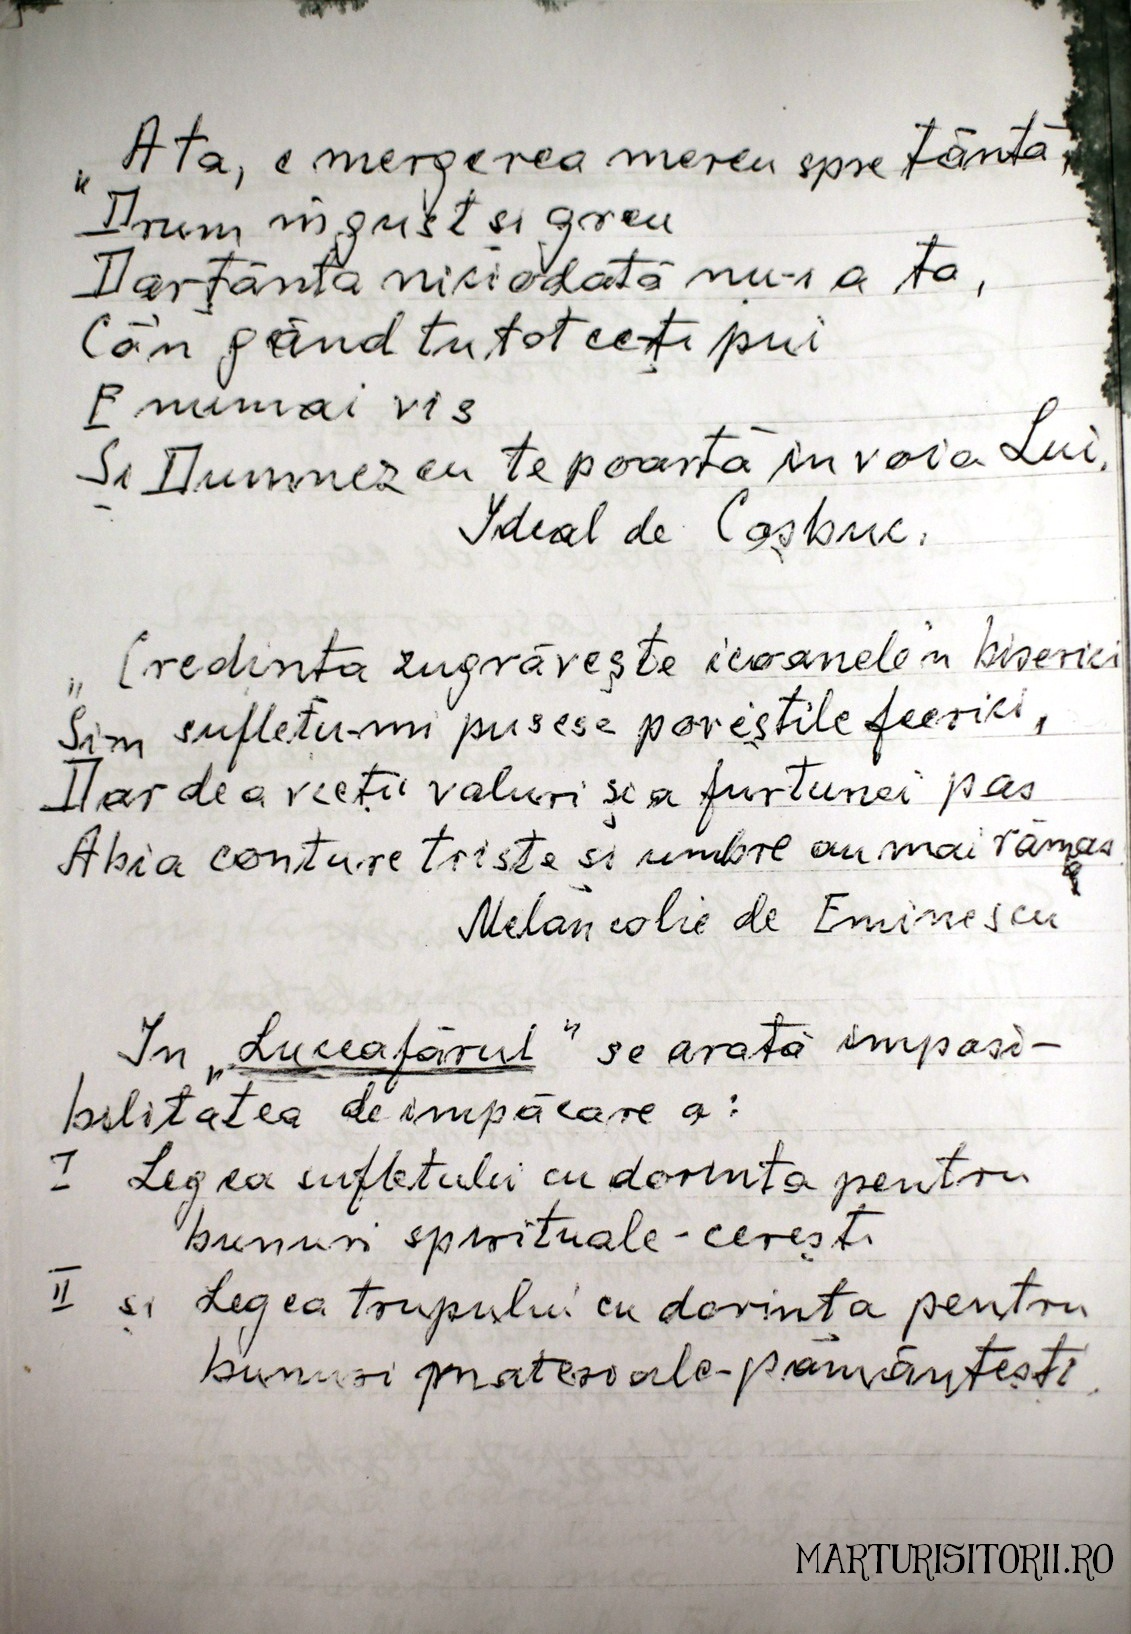 Insemanari de Traian Trifan despre Eminescu Crestinism Luceafarul Cosbuc - Marturisitorii Ro